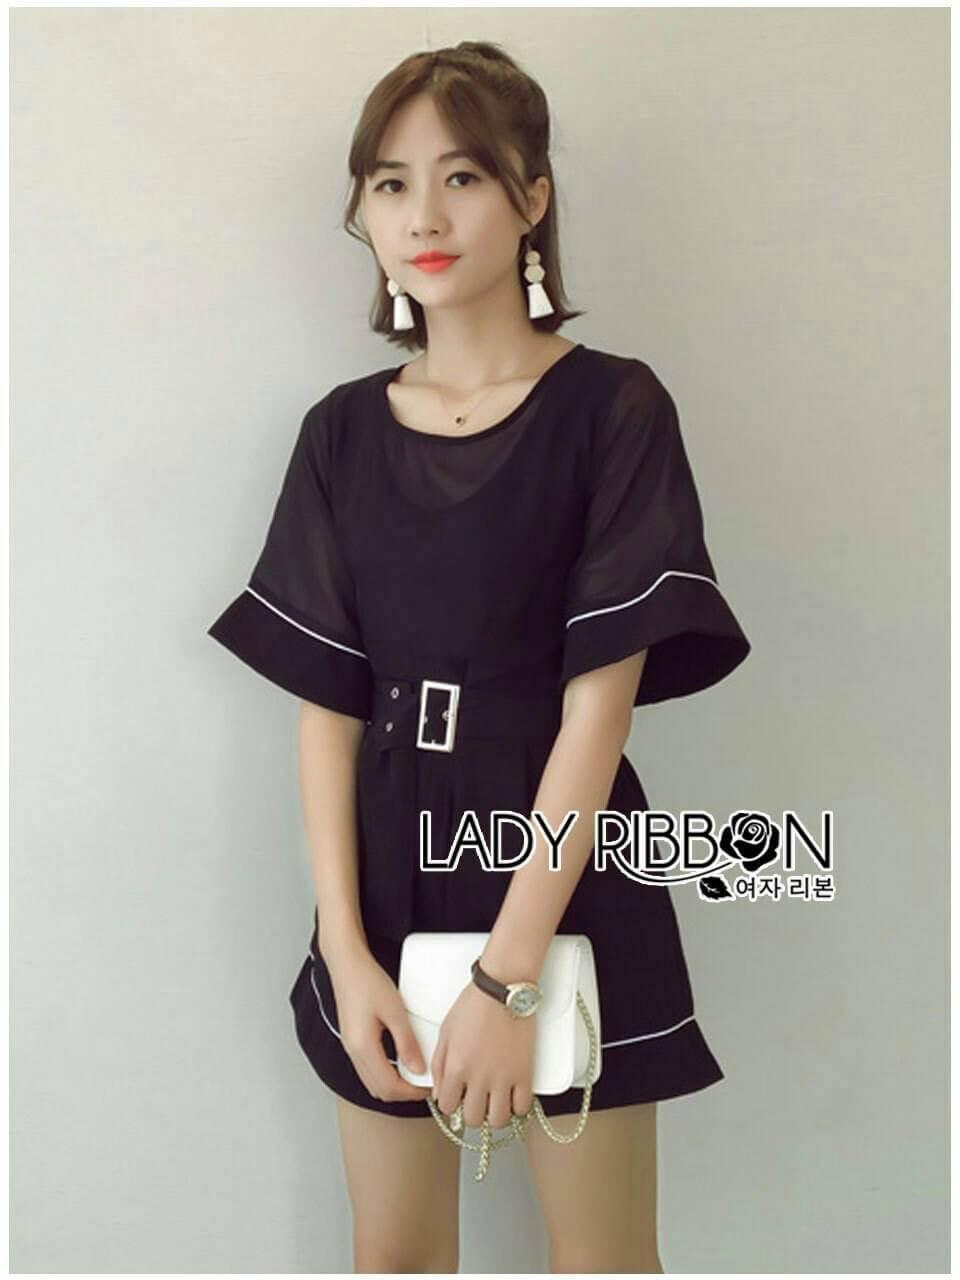 &#x1F380 Lady Ribbon's Made &#x1F380 Lady Courtney Casual Sunday Black Mini Playsuit with Belt